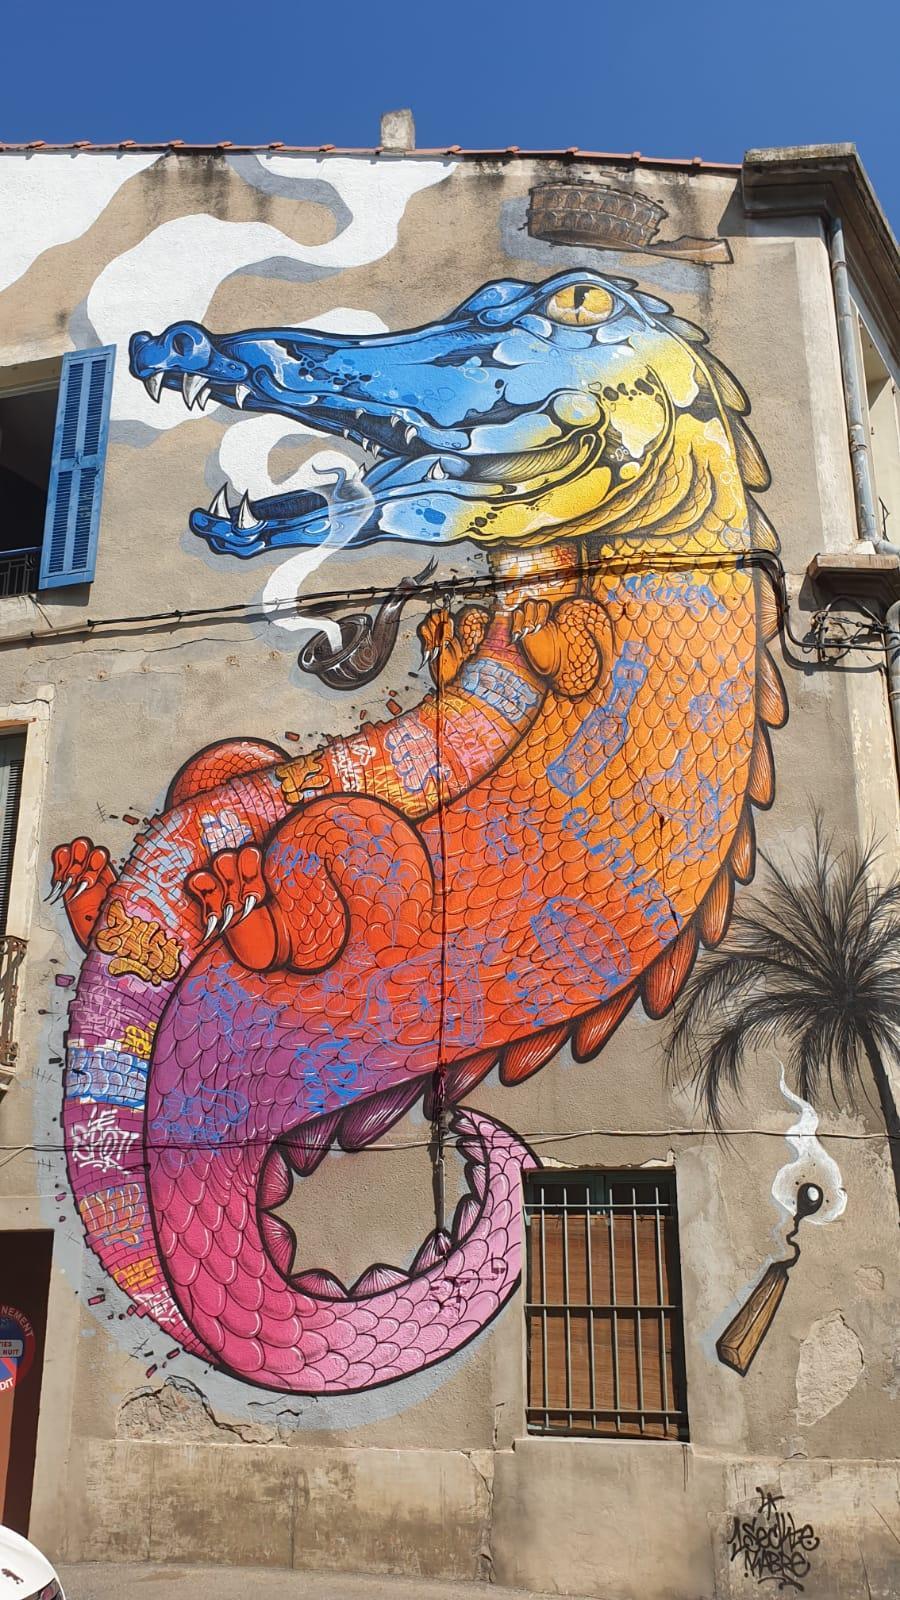 'Le Croco', 1Sekt ( Rue de Bourgogne, 2020)